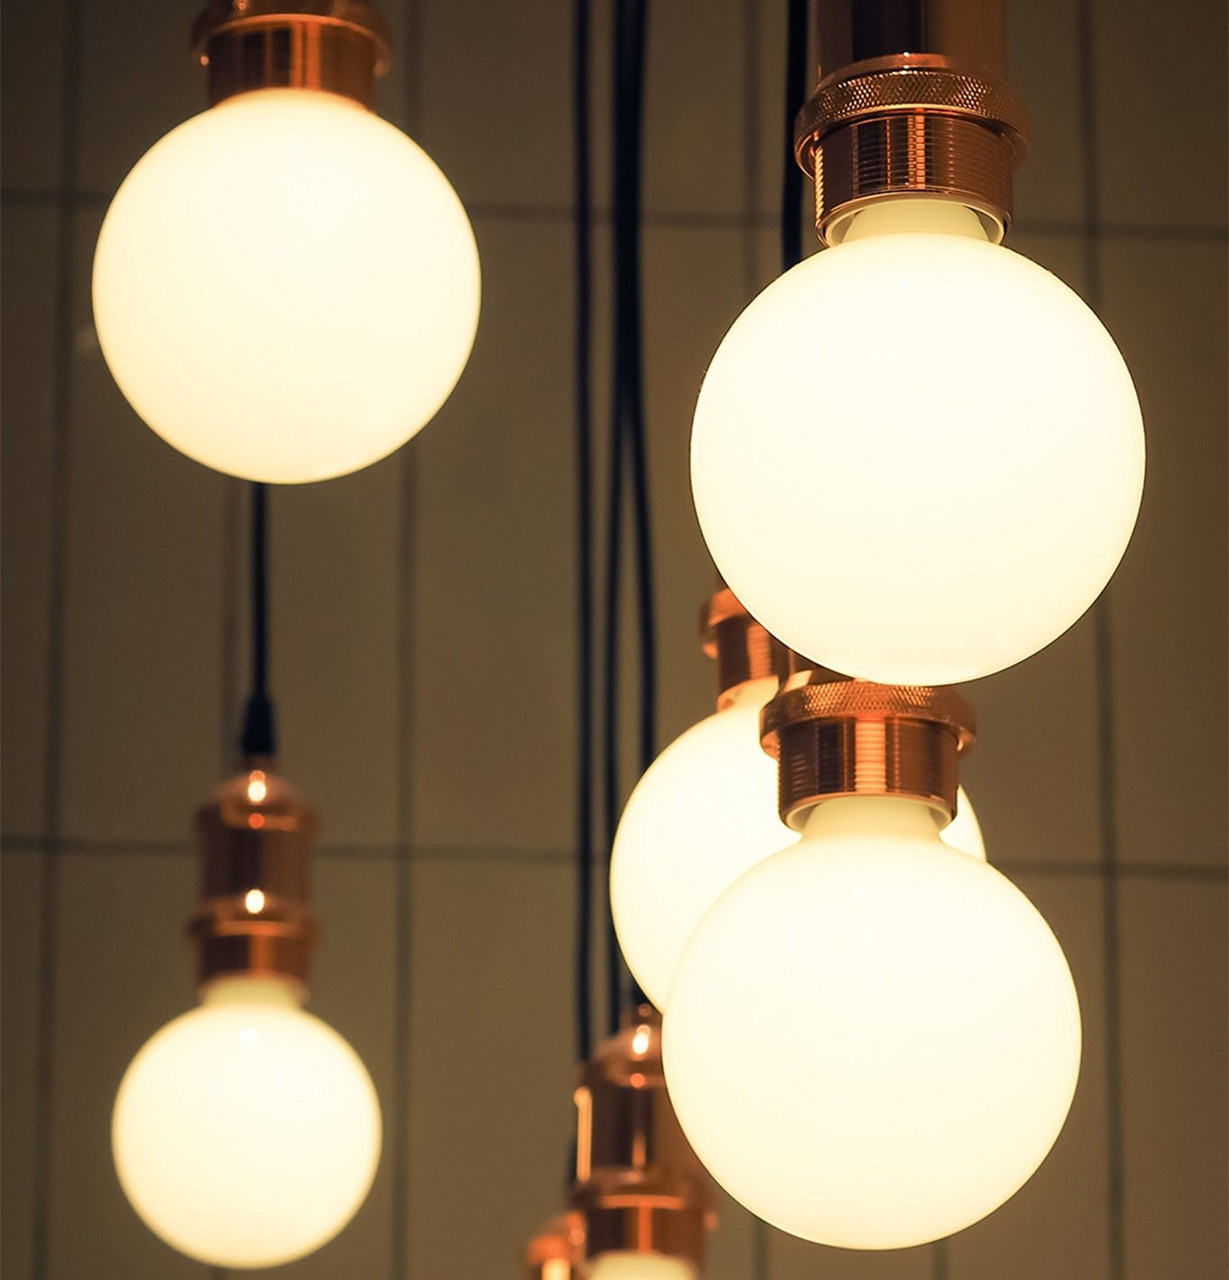 LED Dimmable Globe Screw Light Bulbs